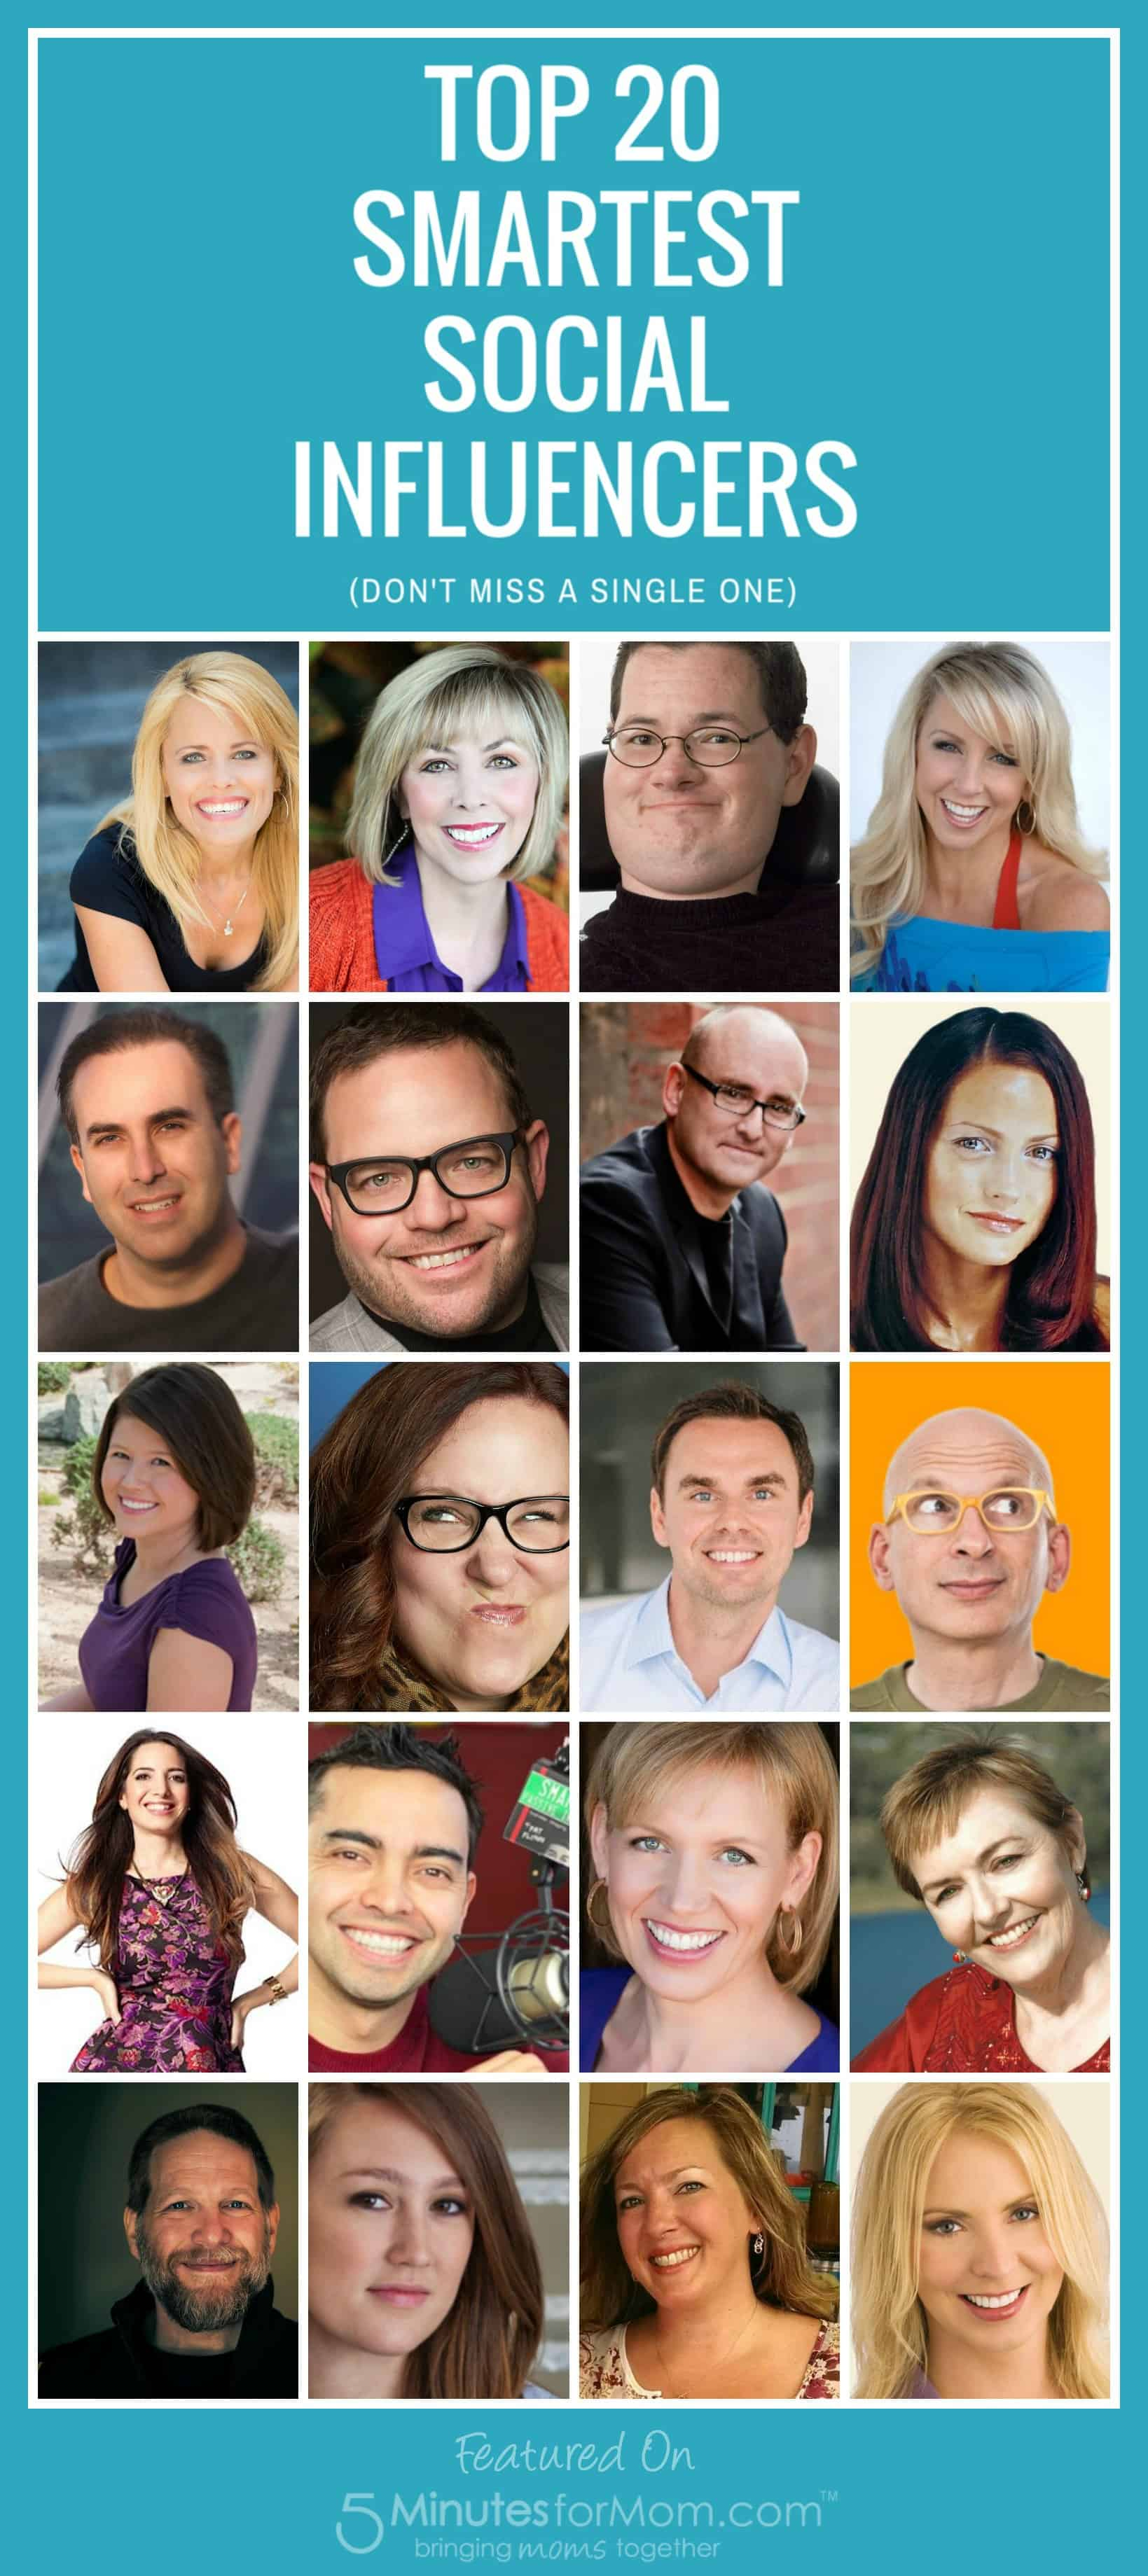 Top 20 Smartest Social Influencers List